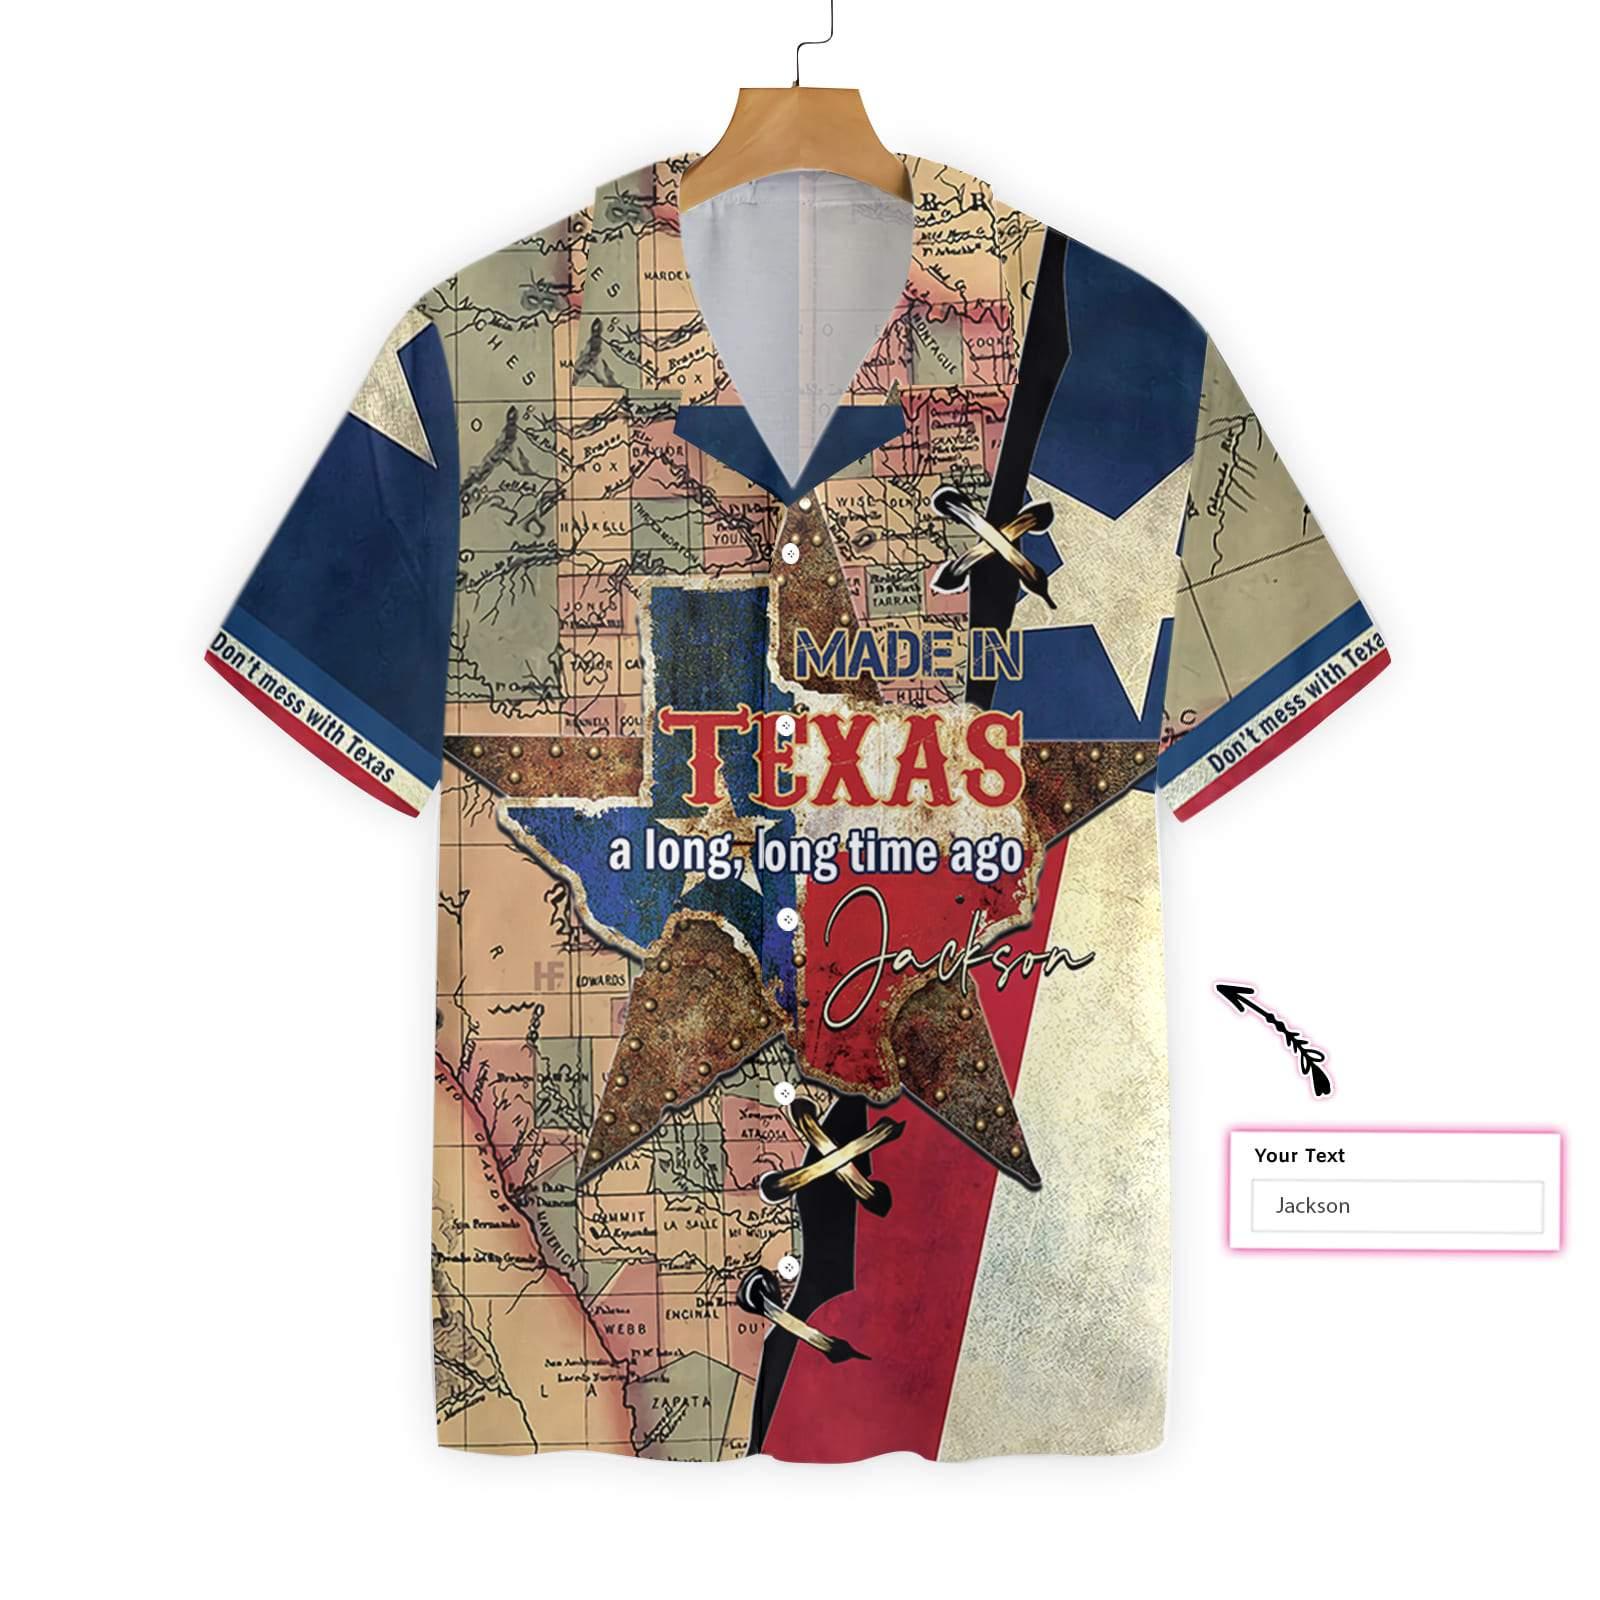 Personalized Made In Texas Long Time Ago Hawaiian Shirt 2